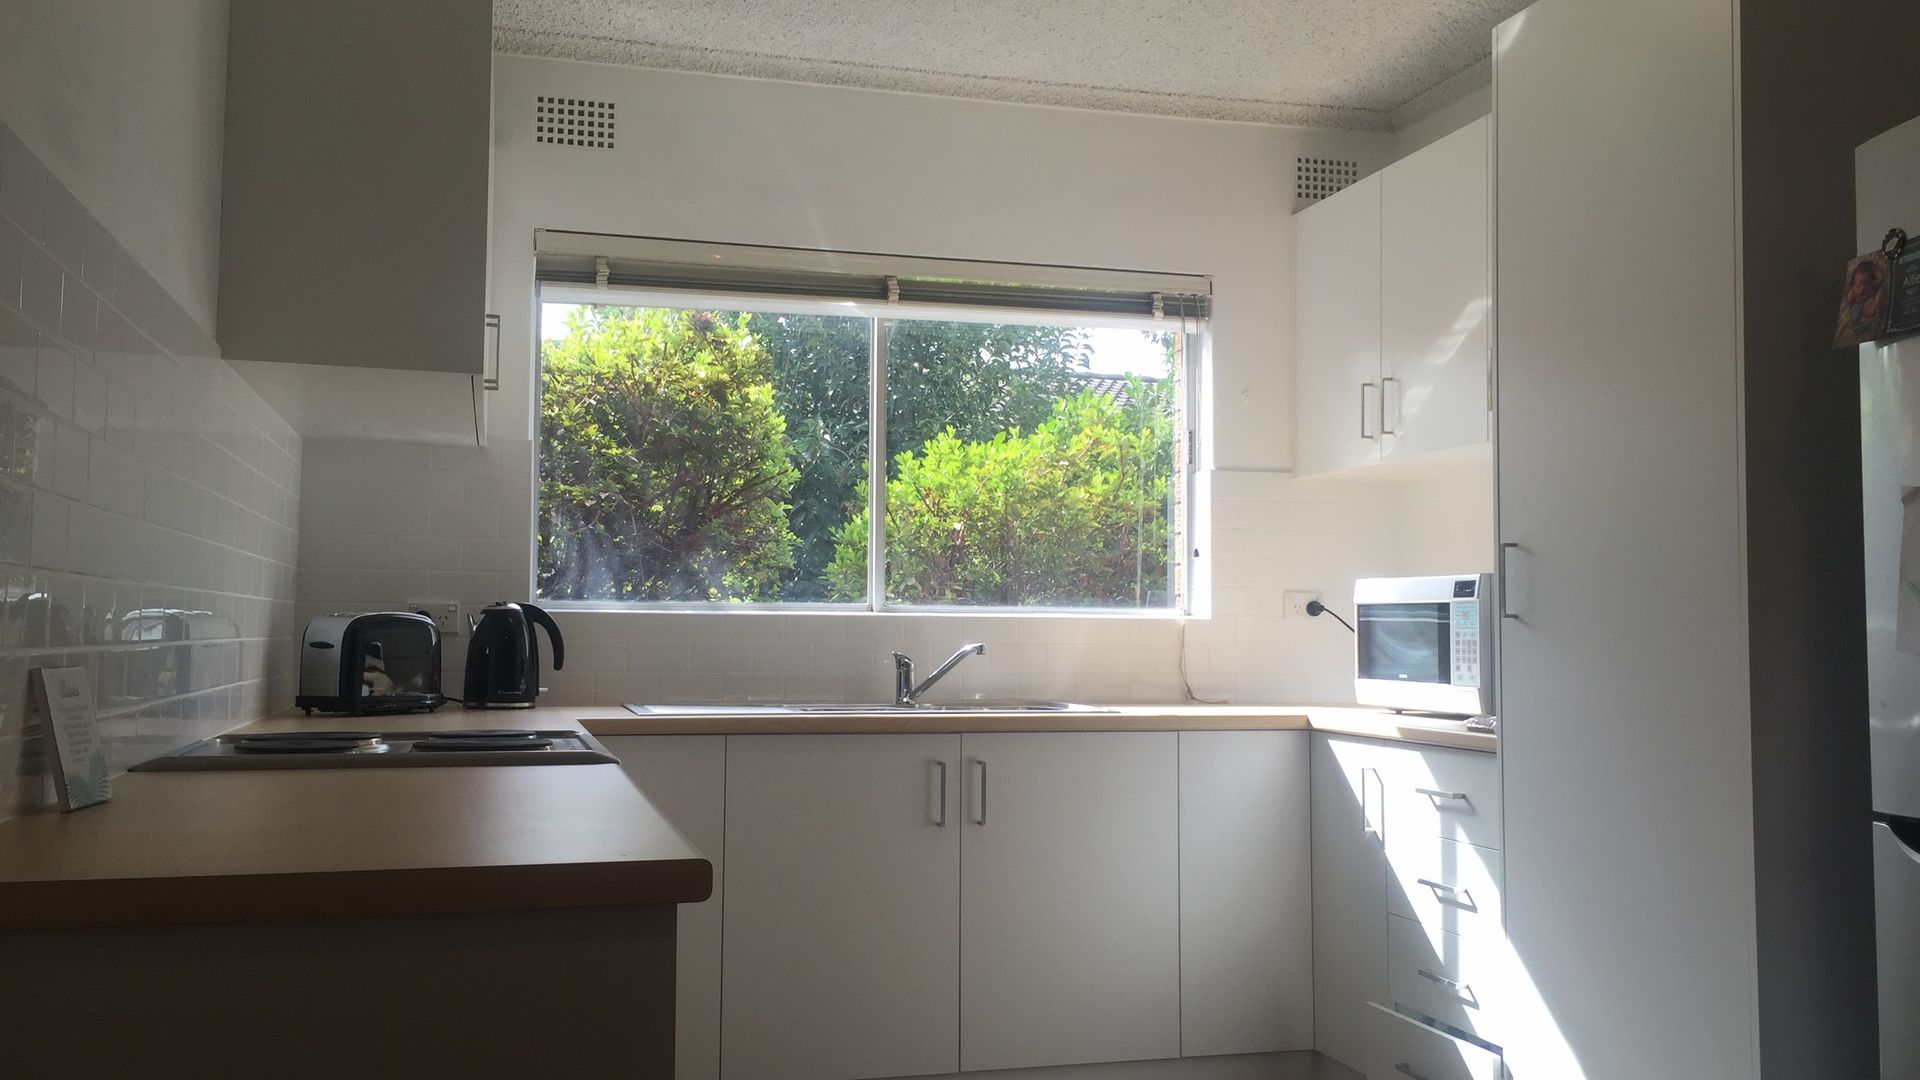 2/17 Zelang Avenue, Figtree NSW 2525, Image 1